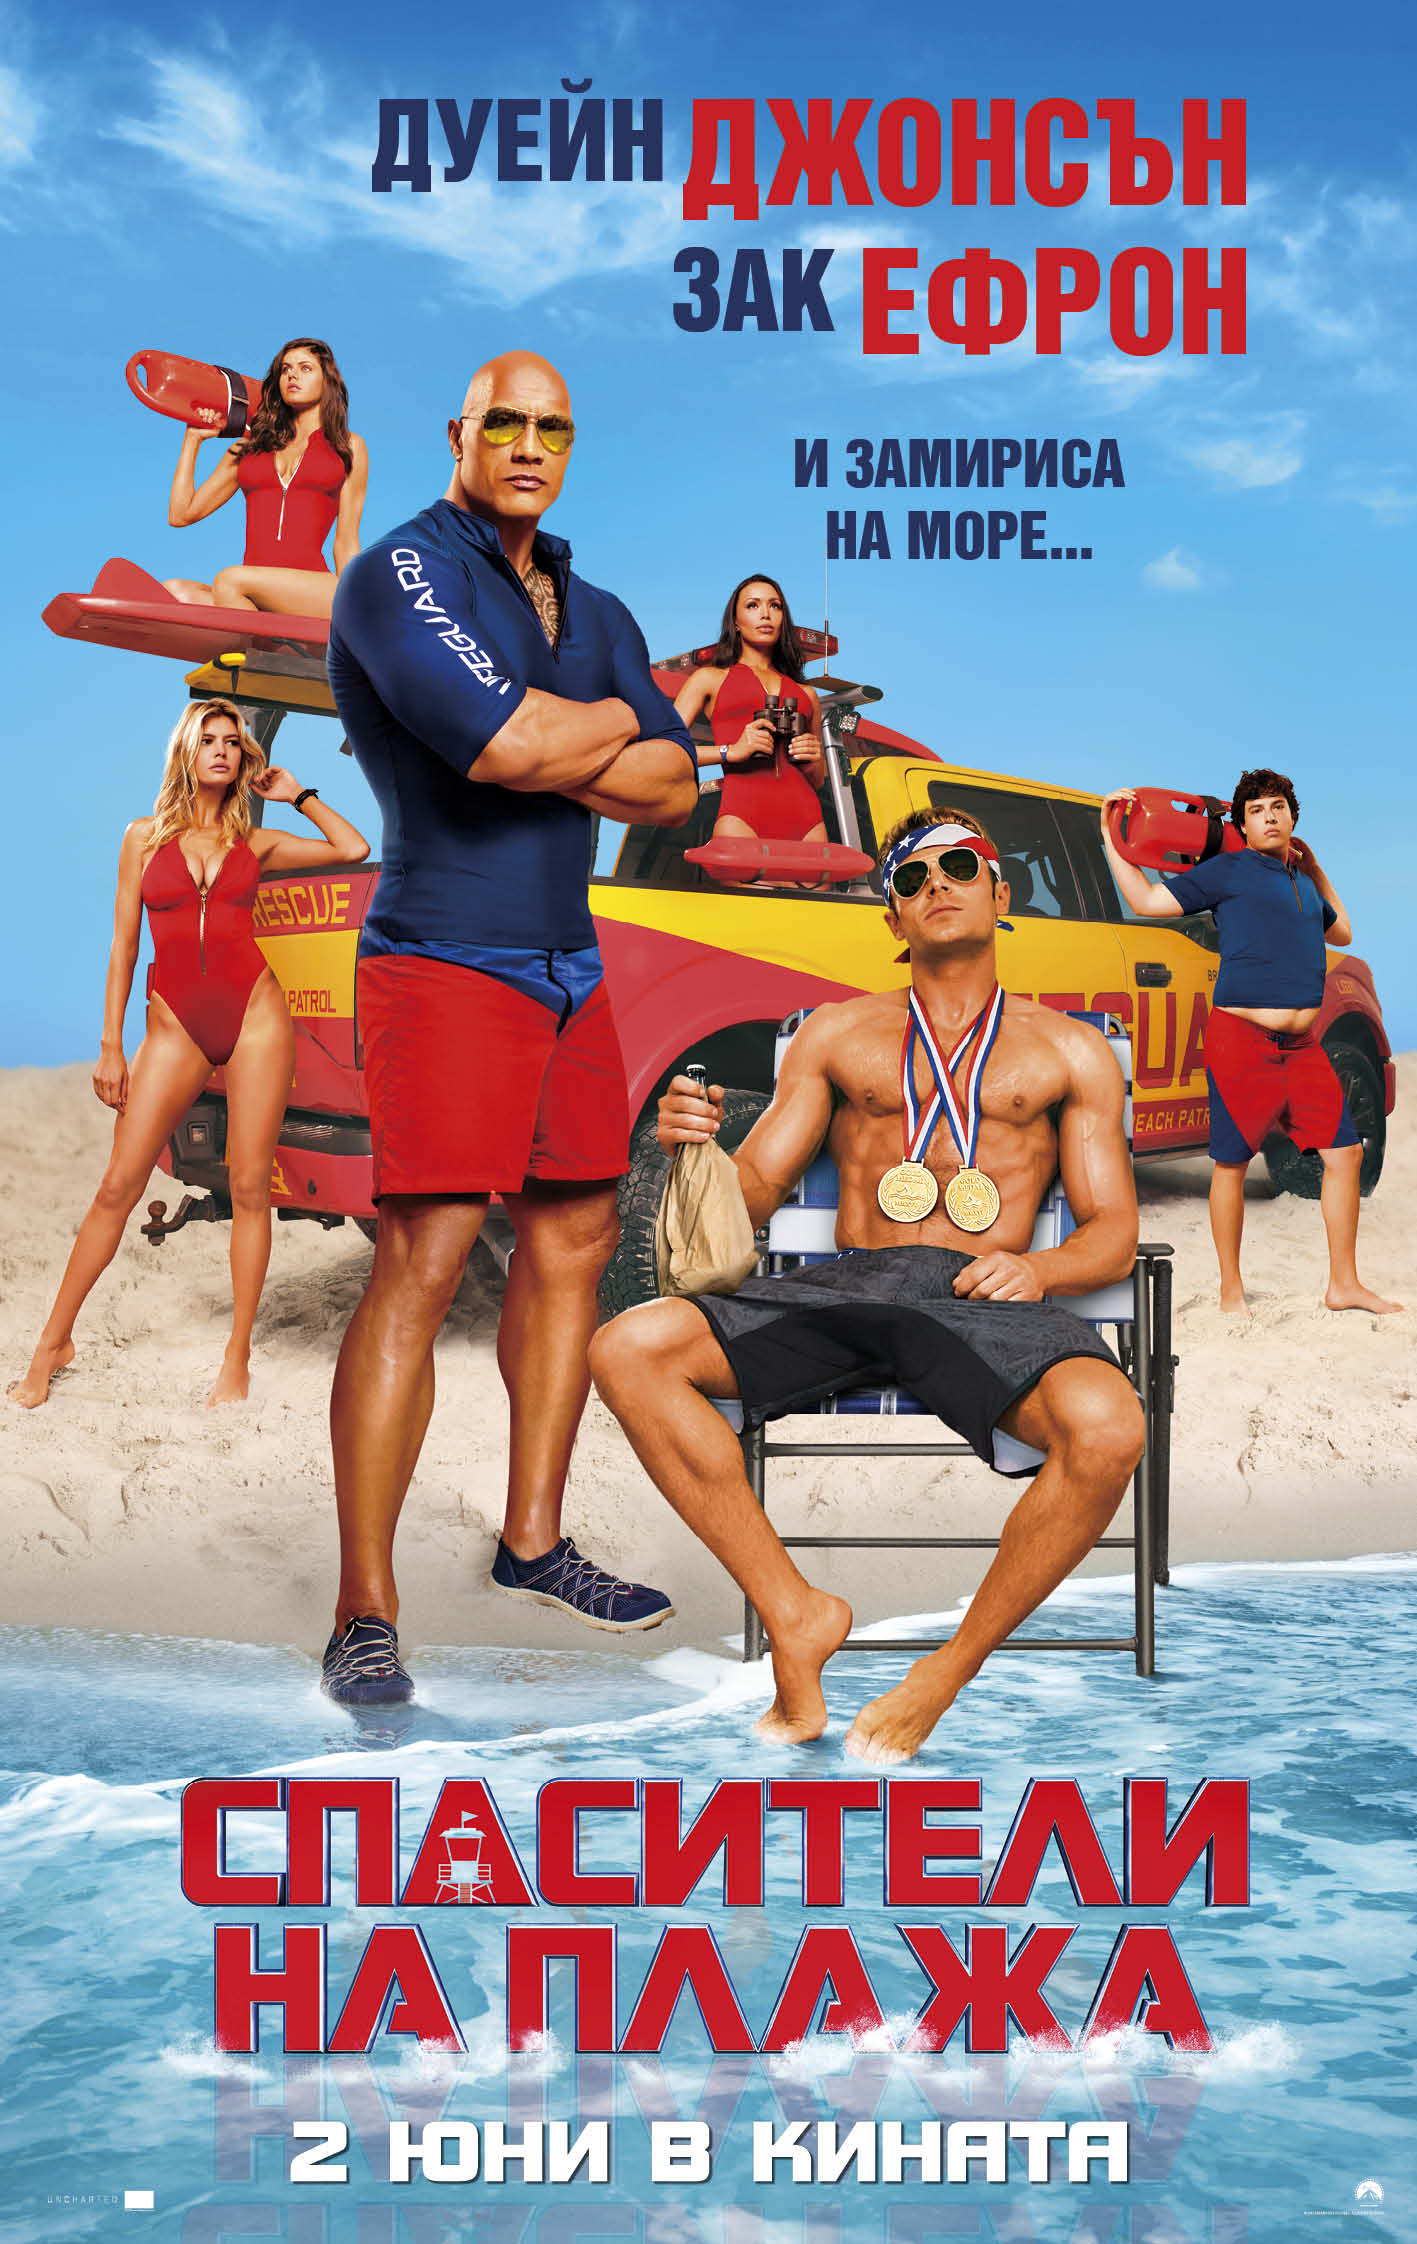 Baywatch / Спасители на плажа (2017)